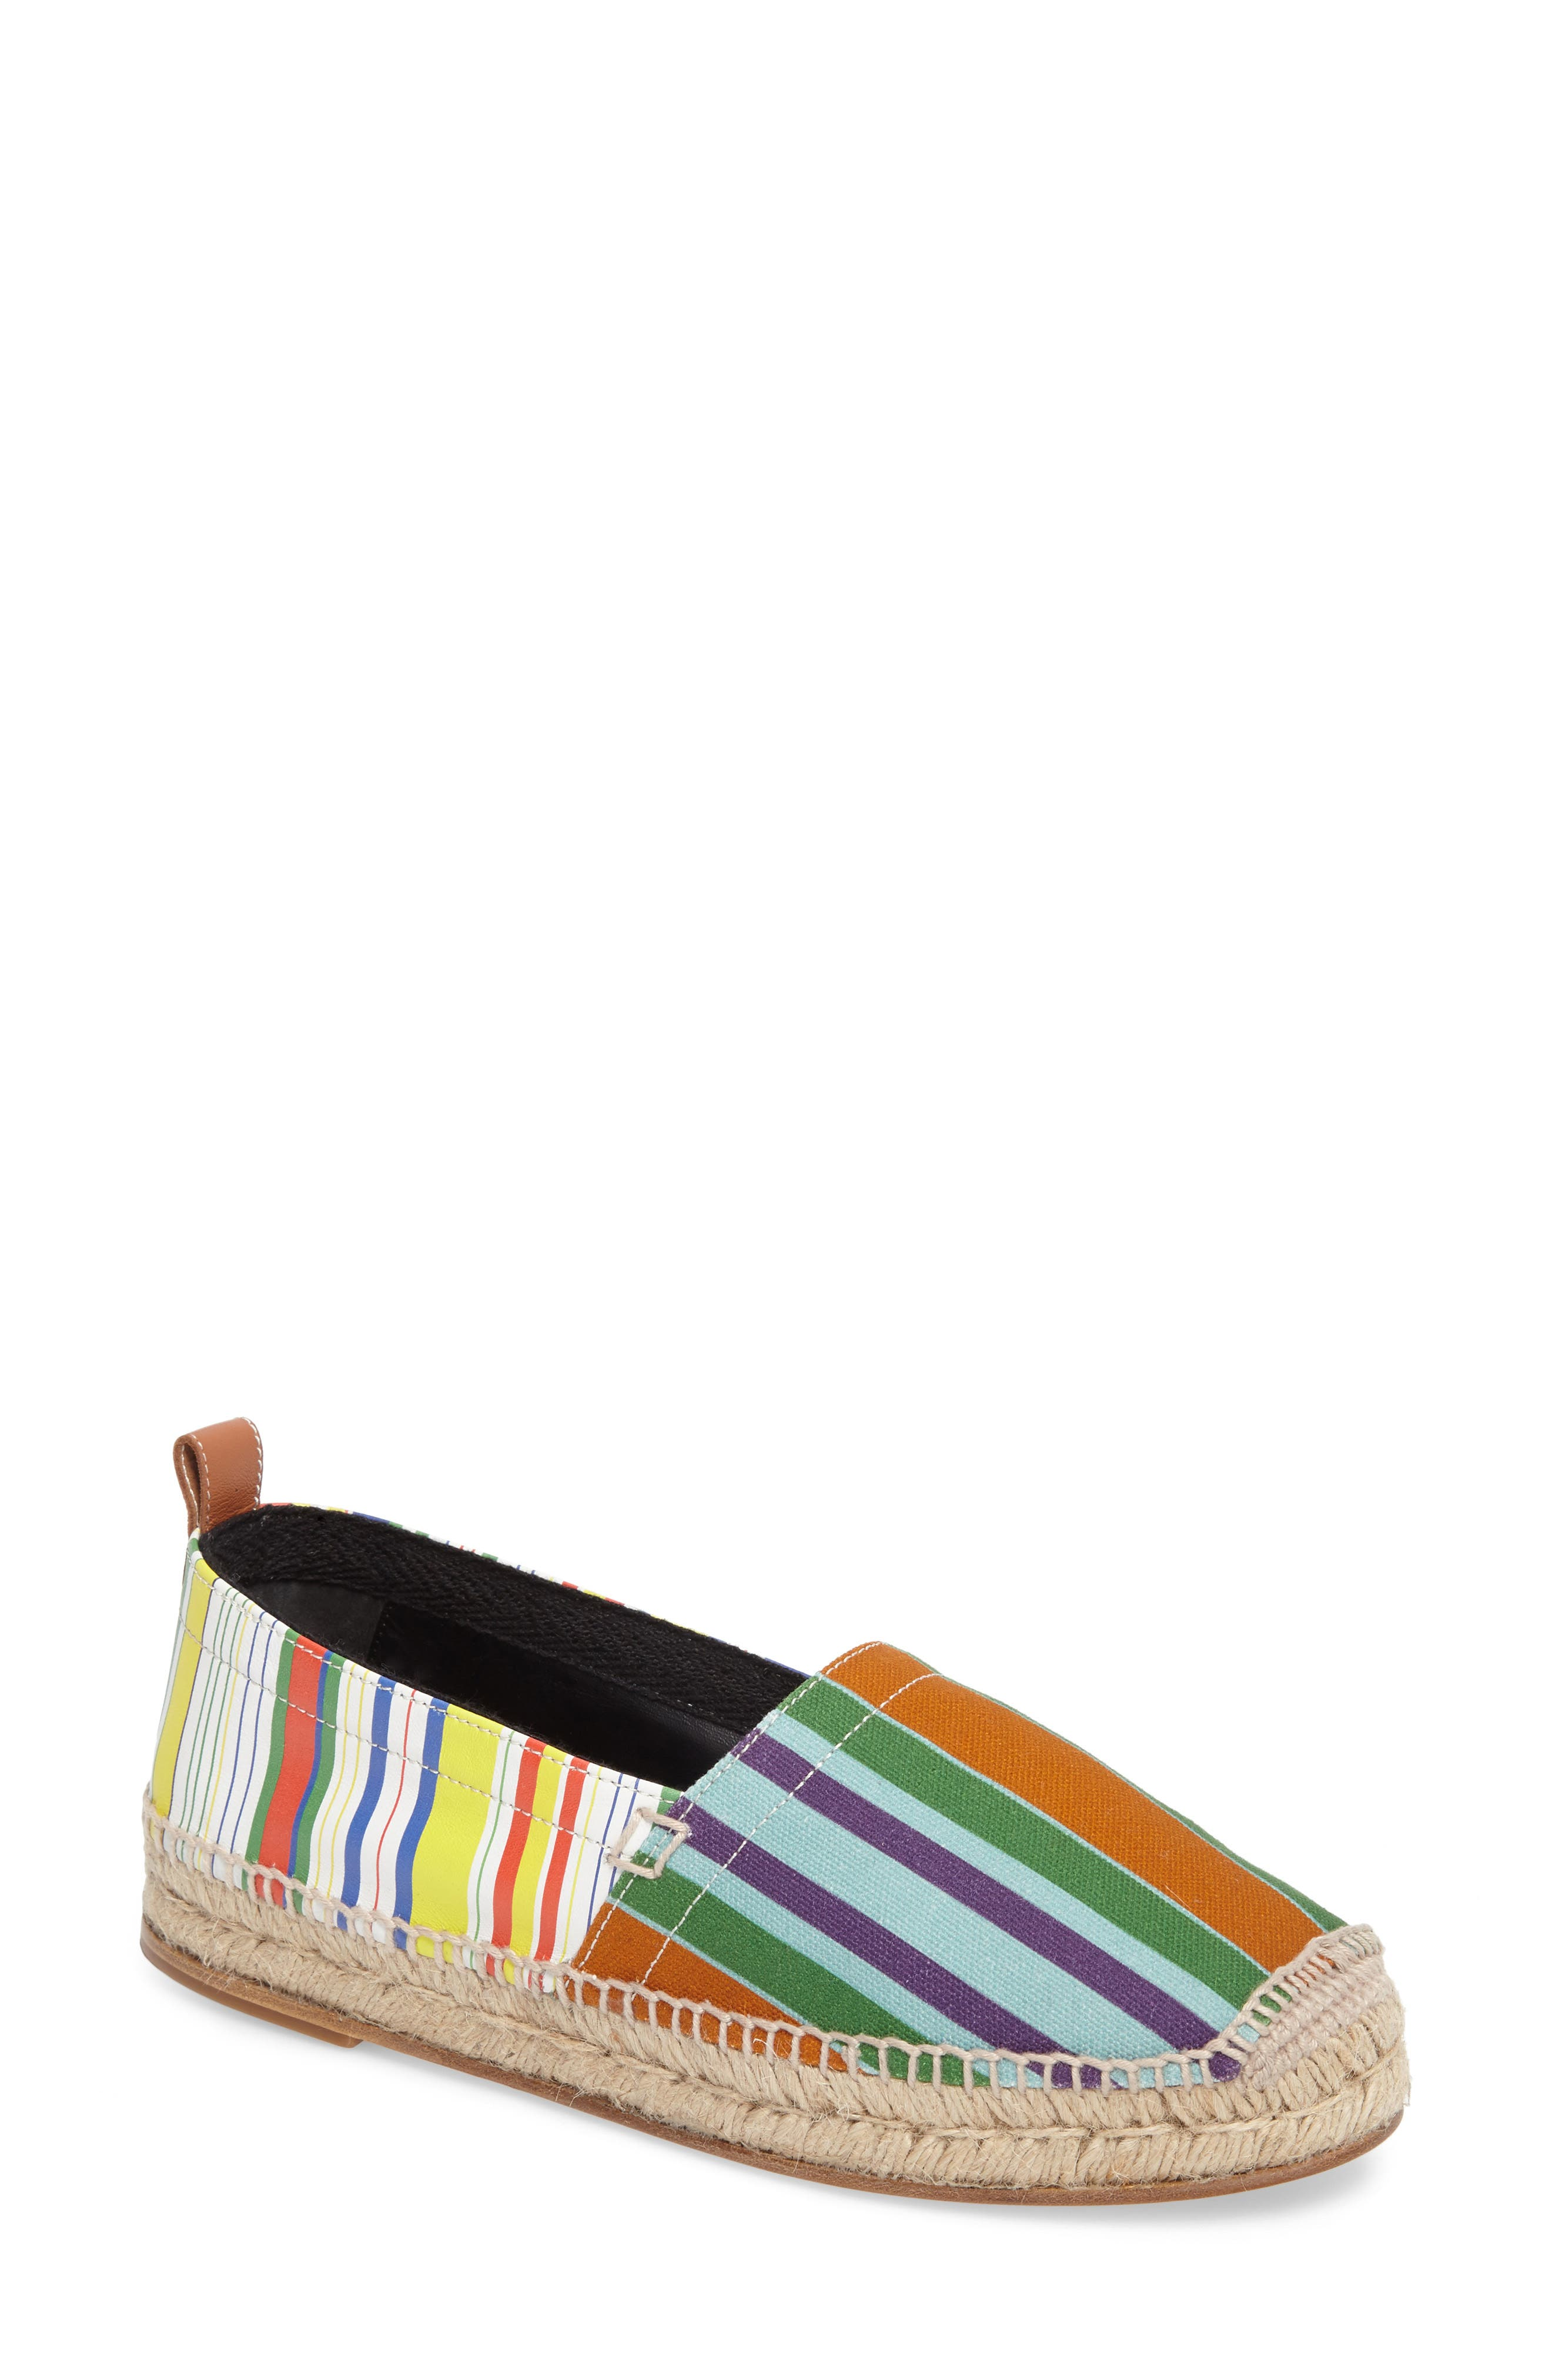 Alternate Image 1 Selected - Loewe Stripe Espadrille (Women)